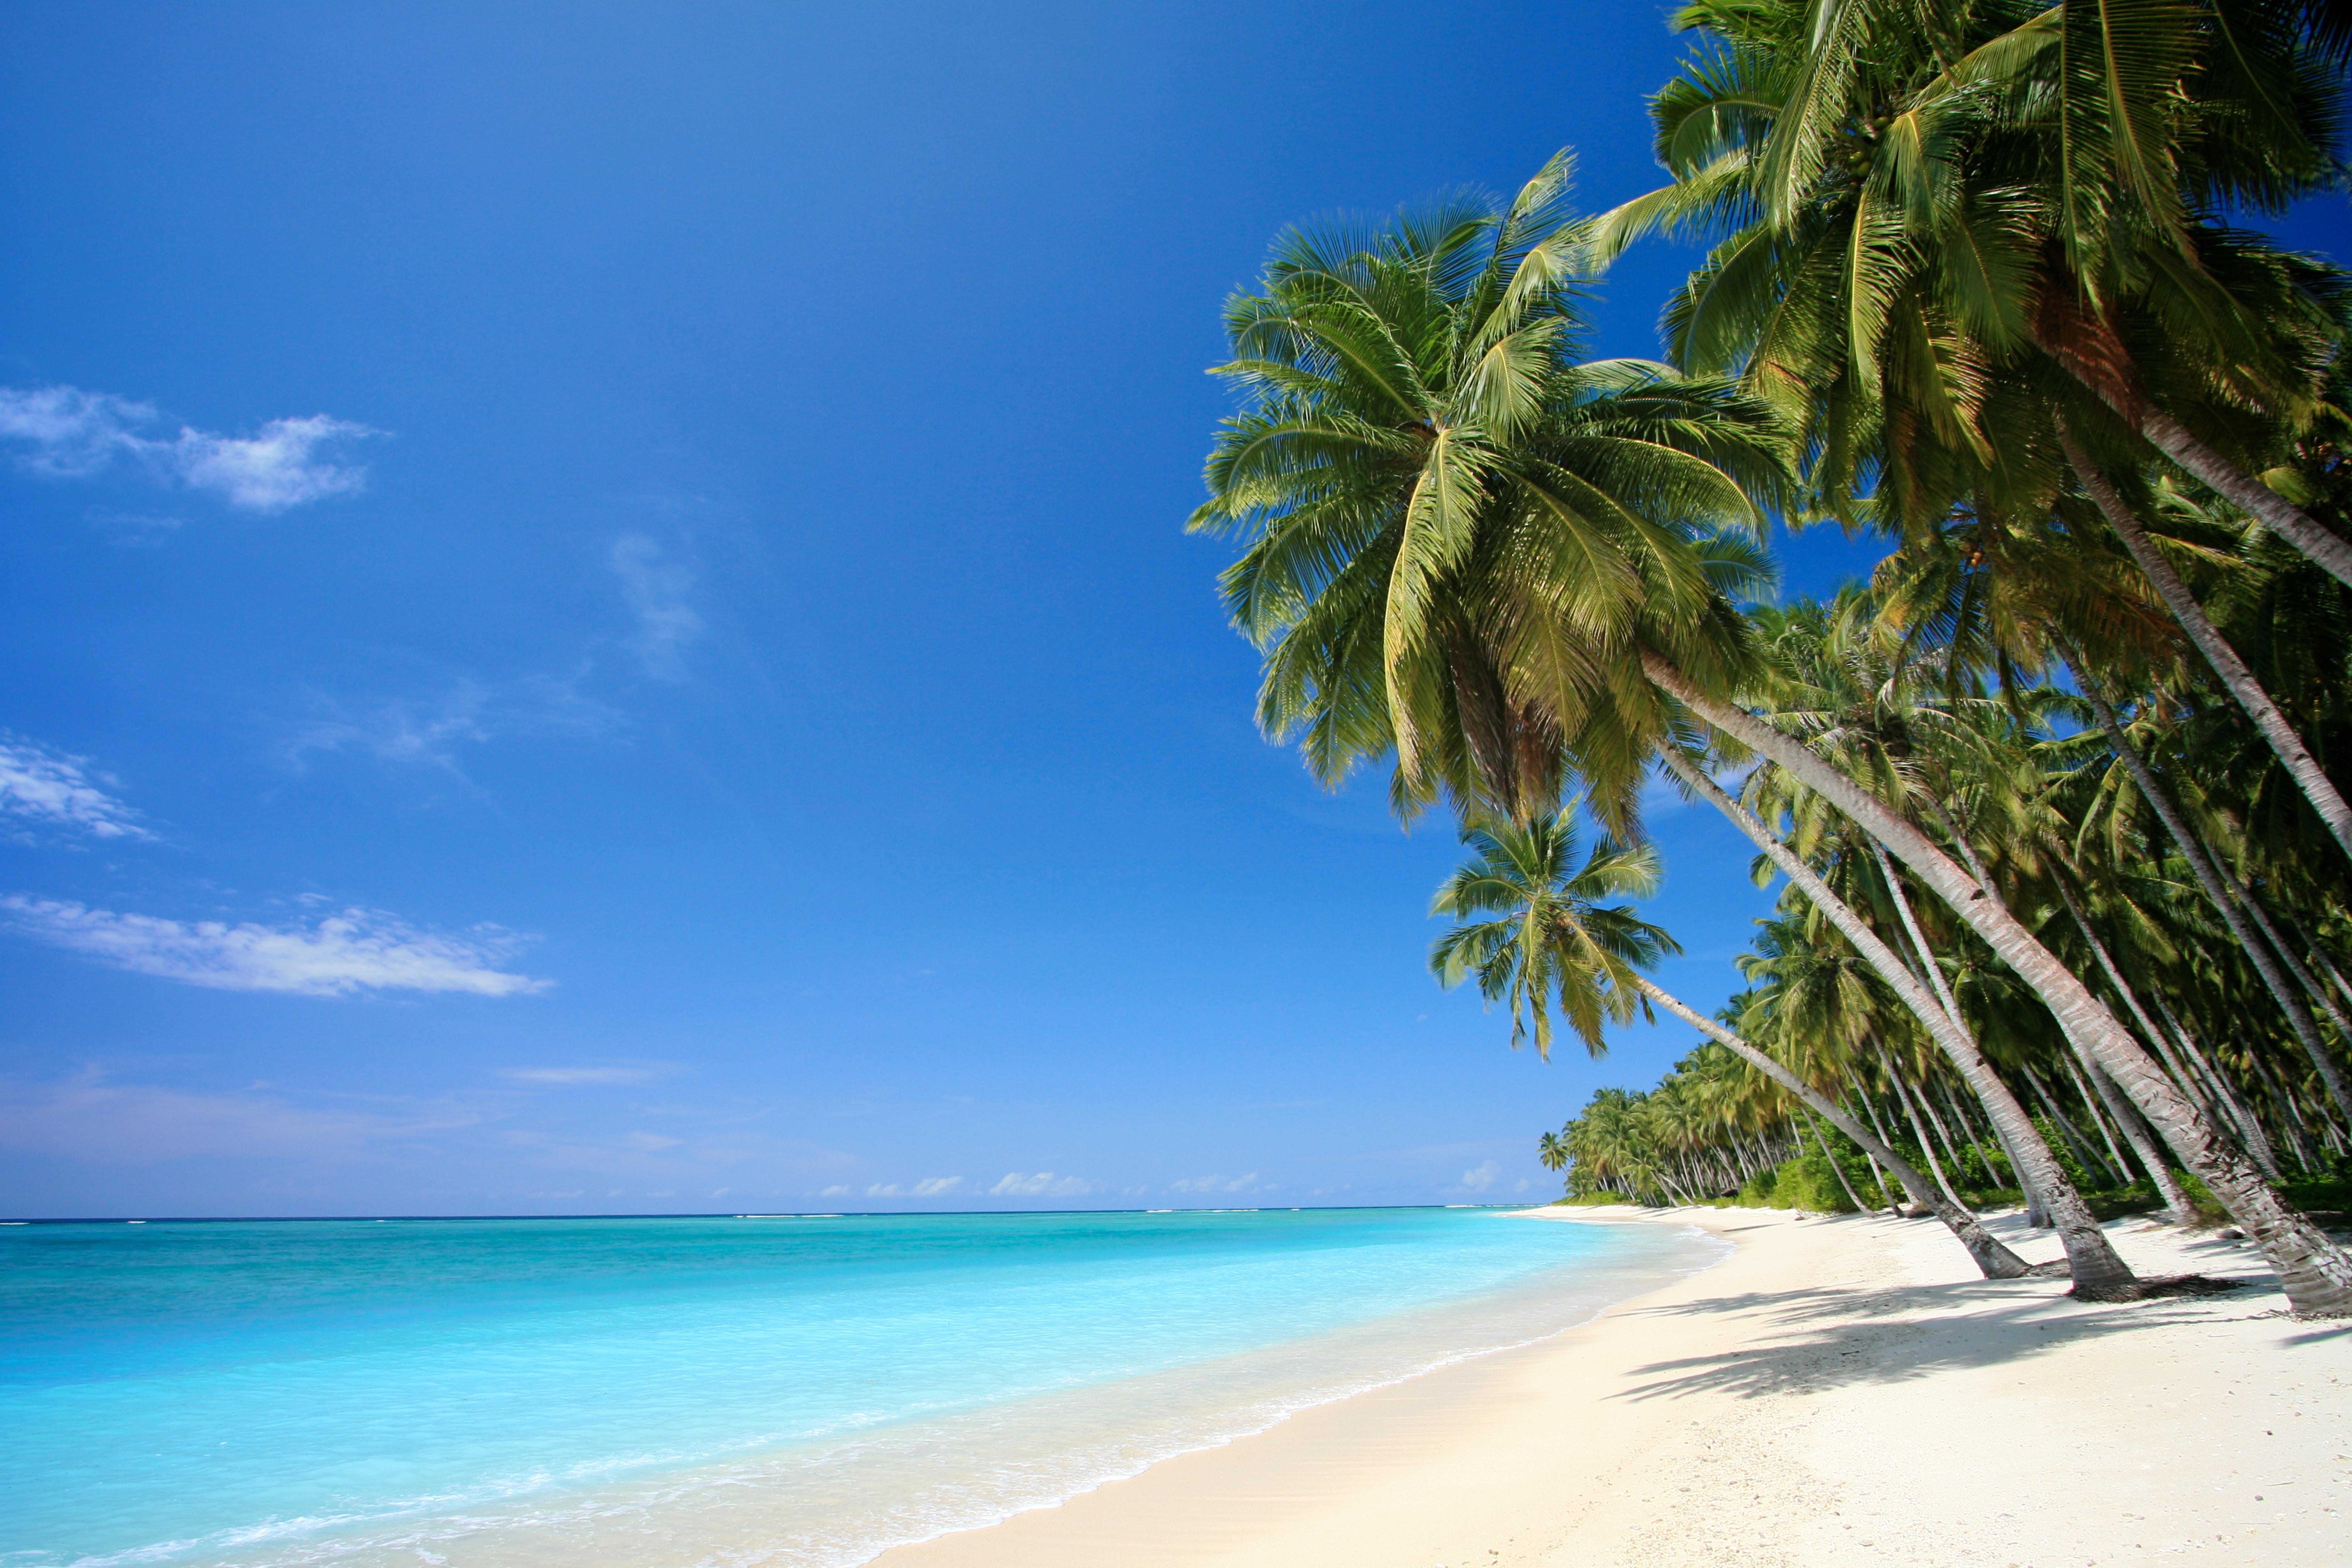 Tropical Beach Screensaver wallpaper Tropical Beach Screensaver hd 7512x5008